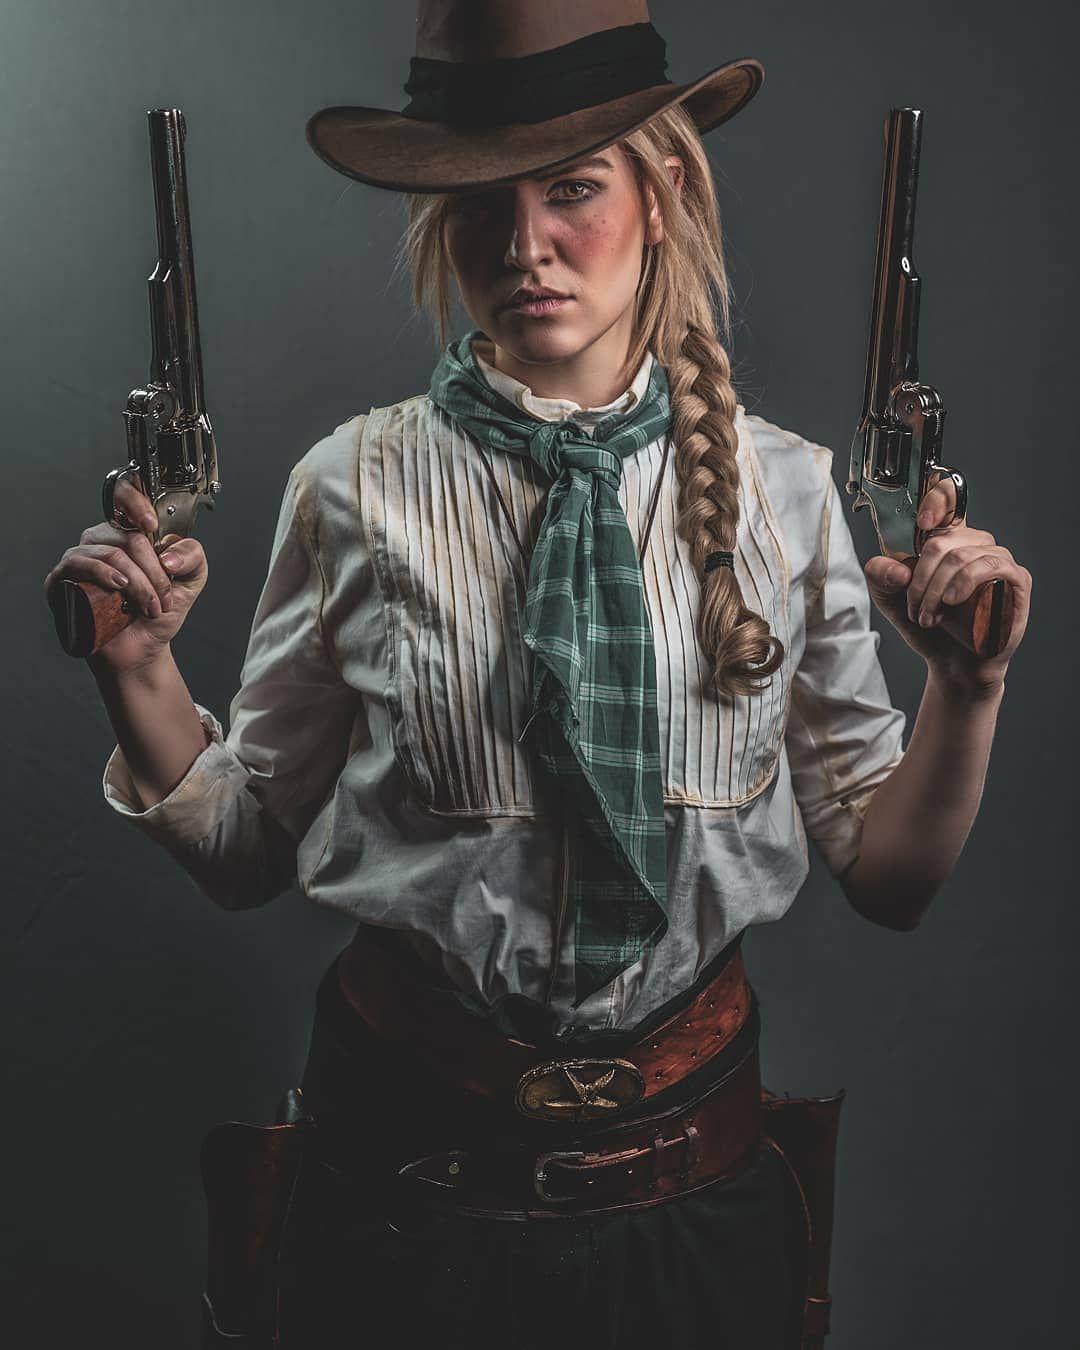 Sadie Adler cosplay (Red Dead Redemption 2) http://bit.ly